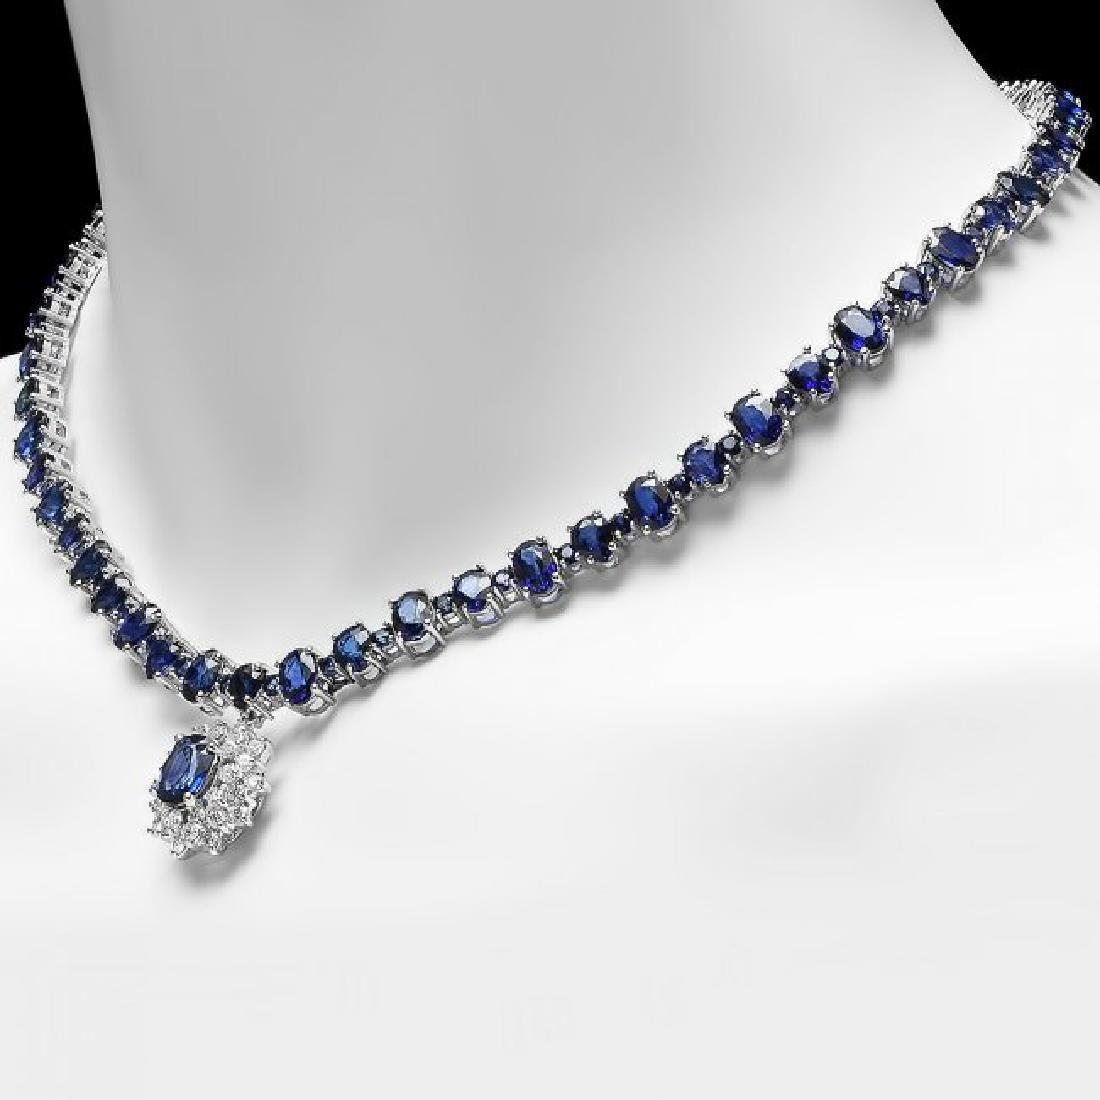 14k Gold 49.5ct Sapphire 1.70ct Diamond Necklace - 4